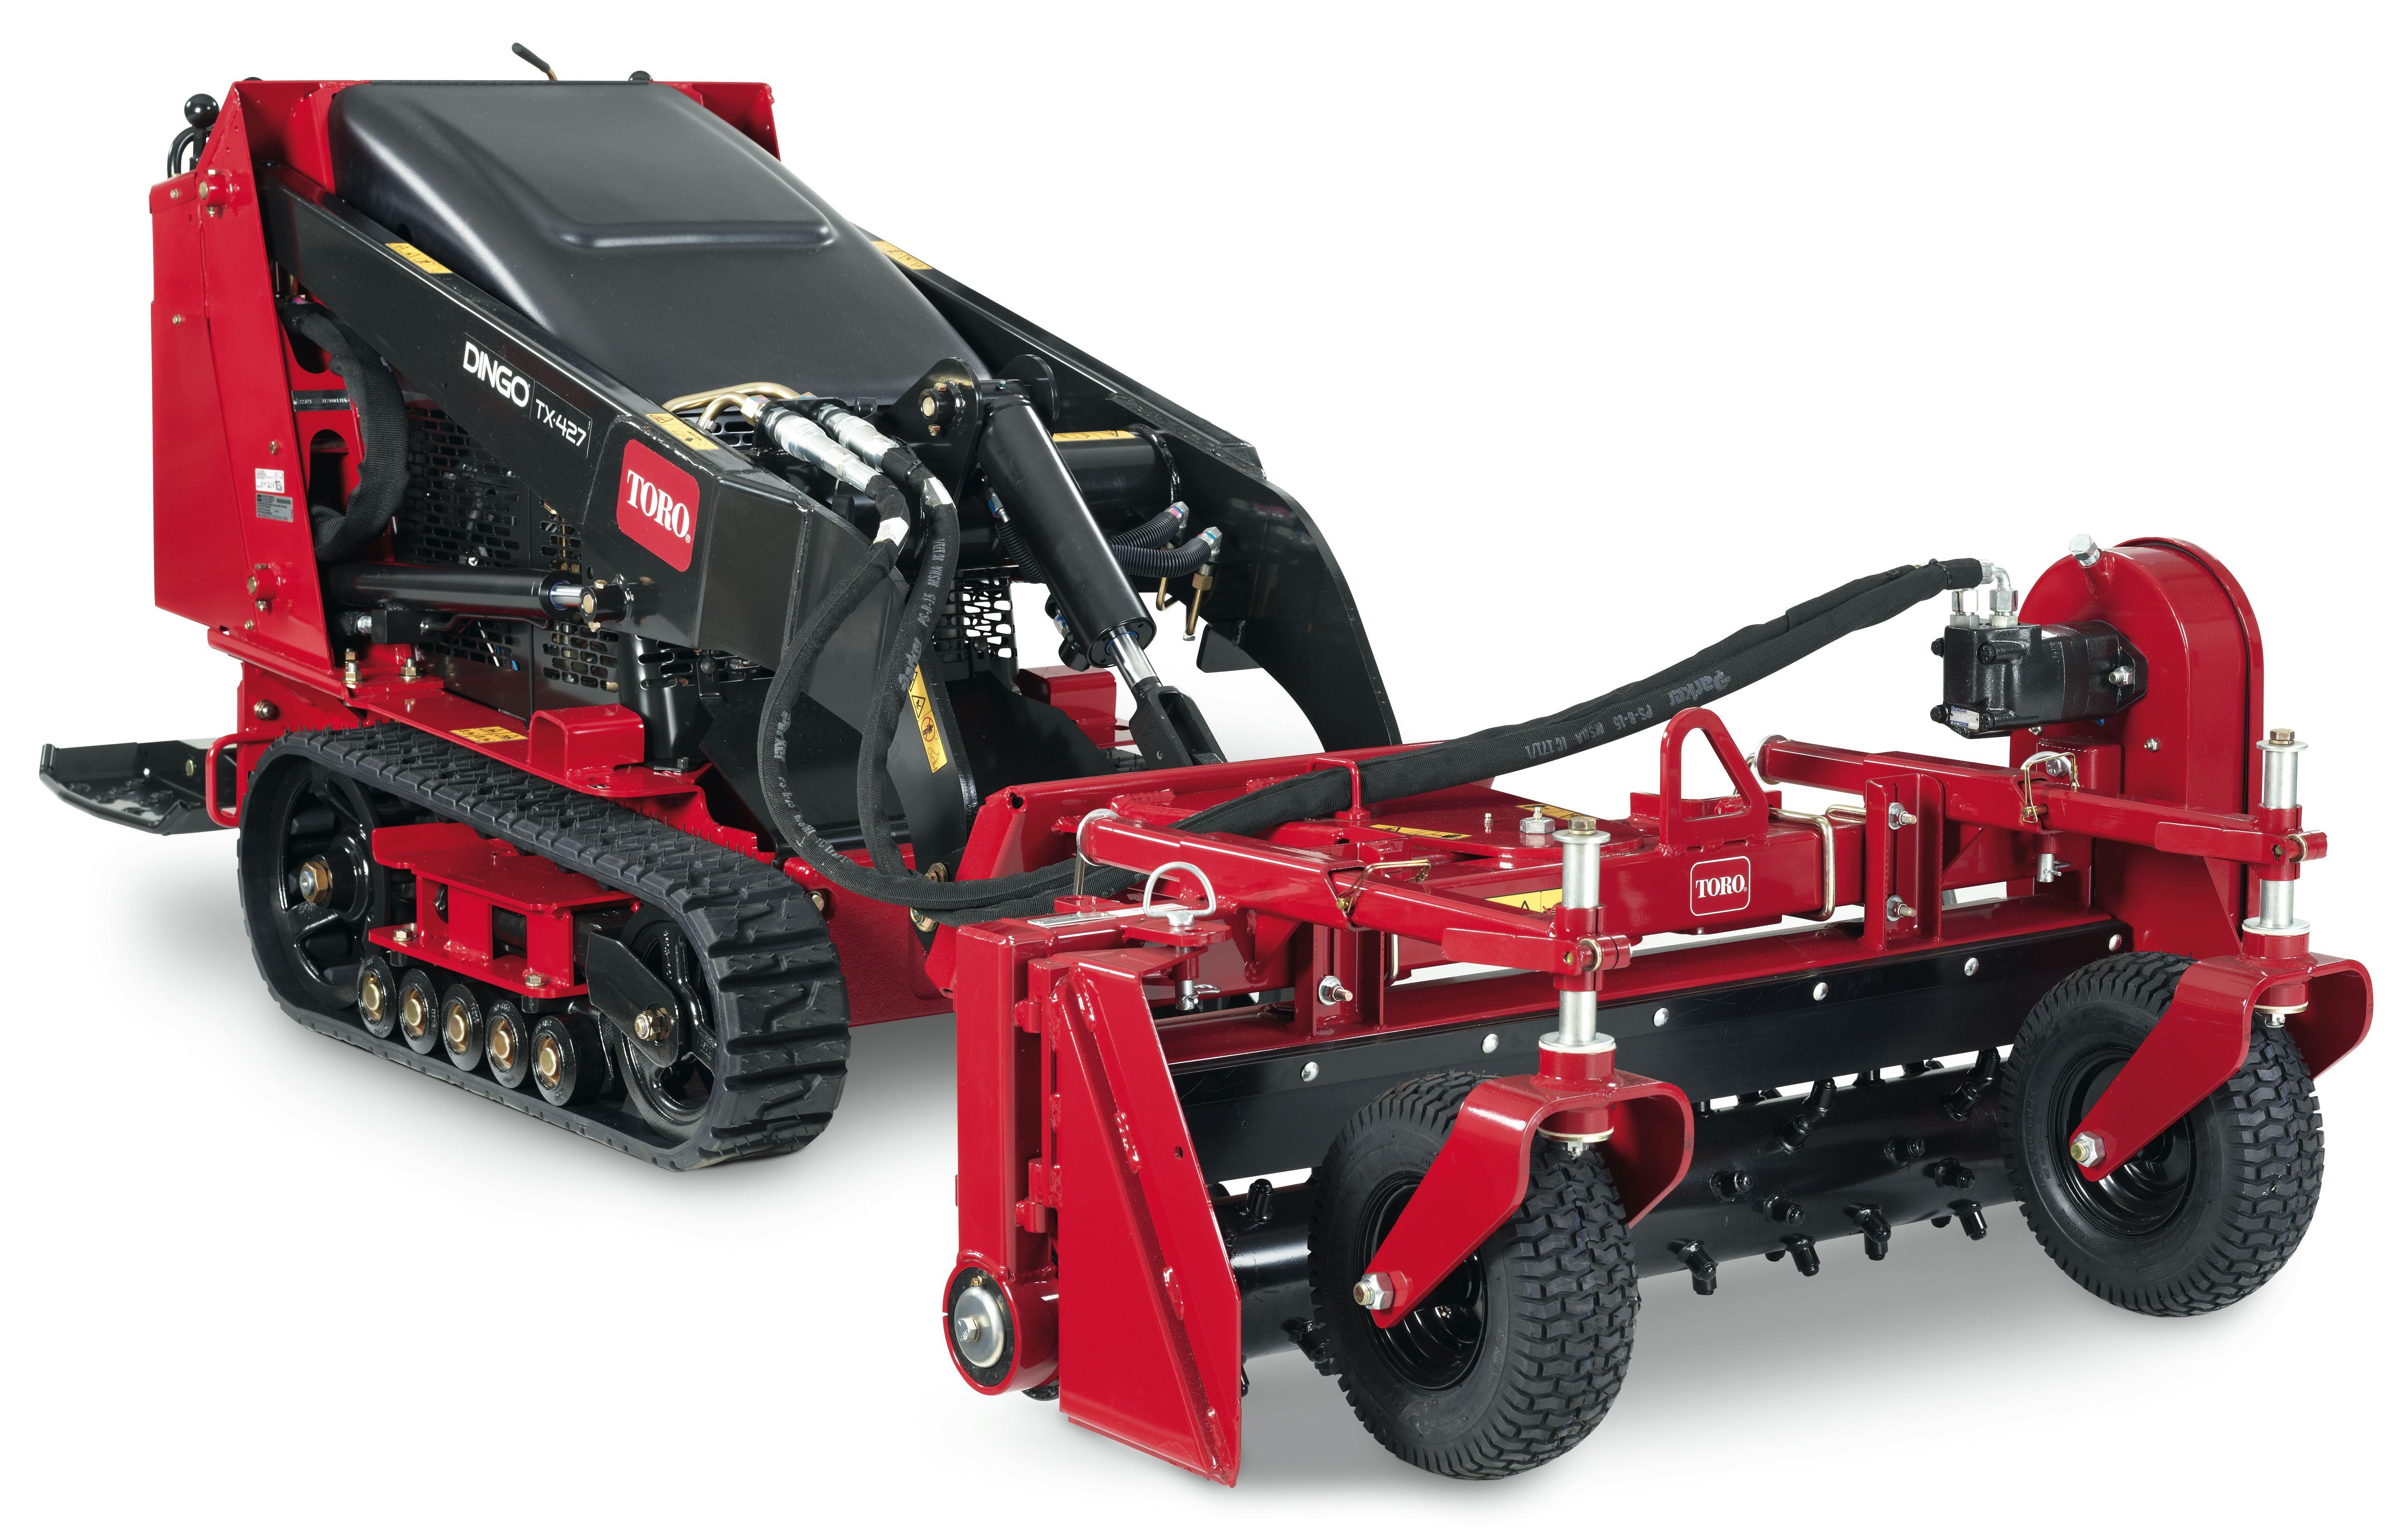 harley rake attachment mini skid steer compact power equipment